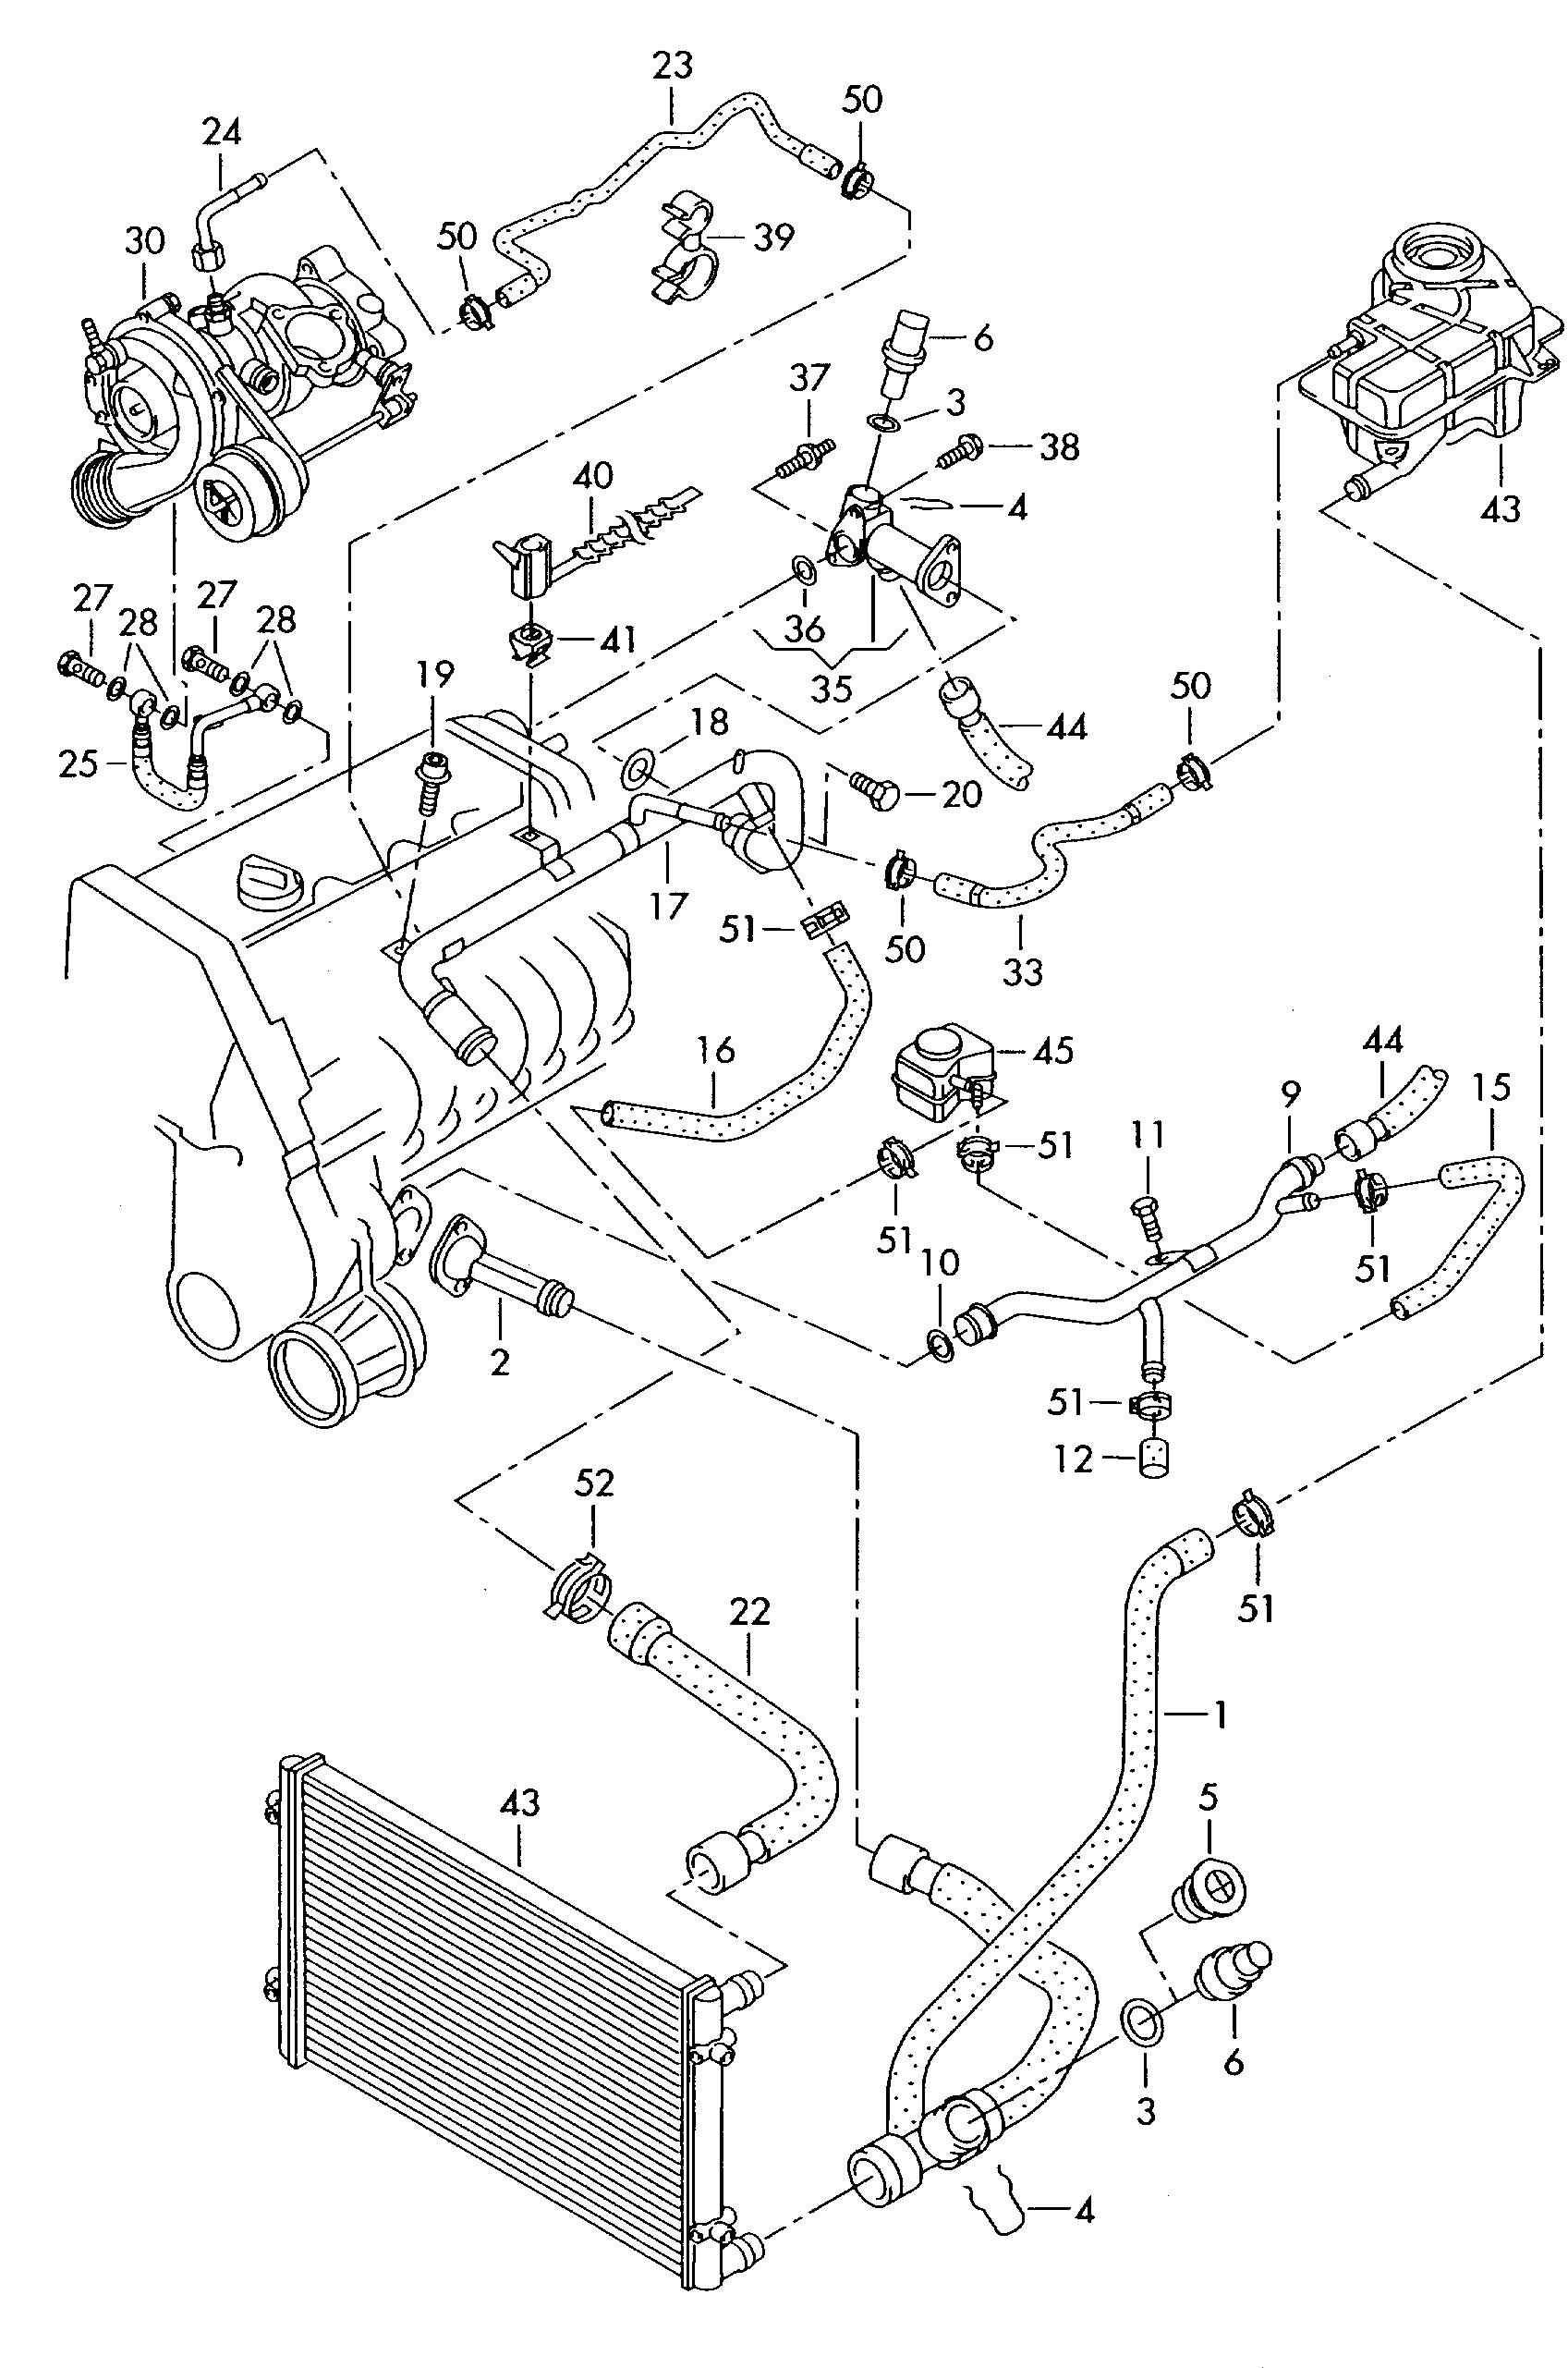 2003 Vw Engine Diagram - Cars Wiring Diagram